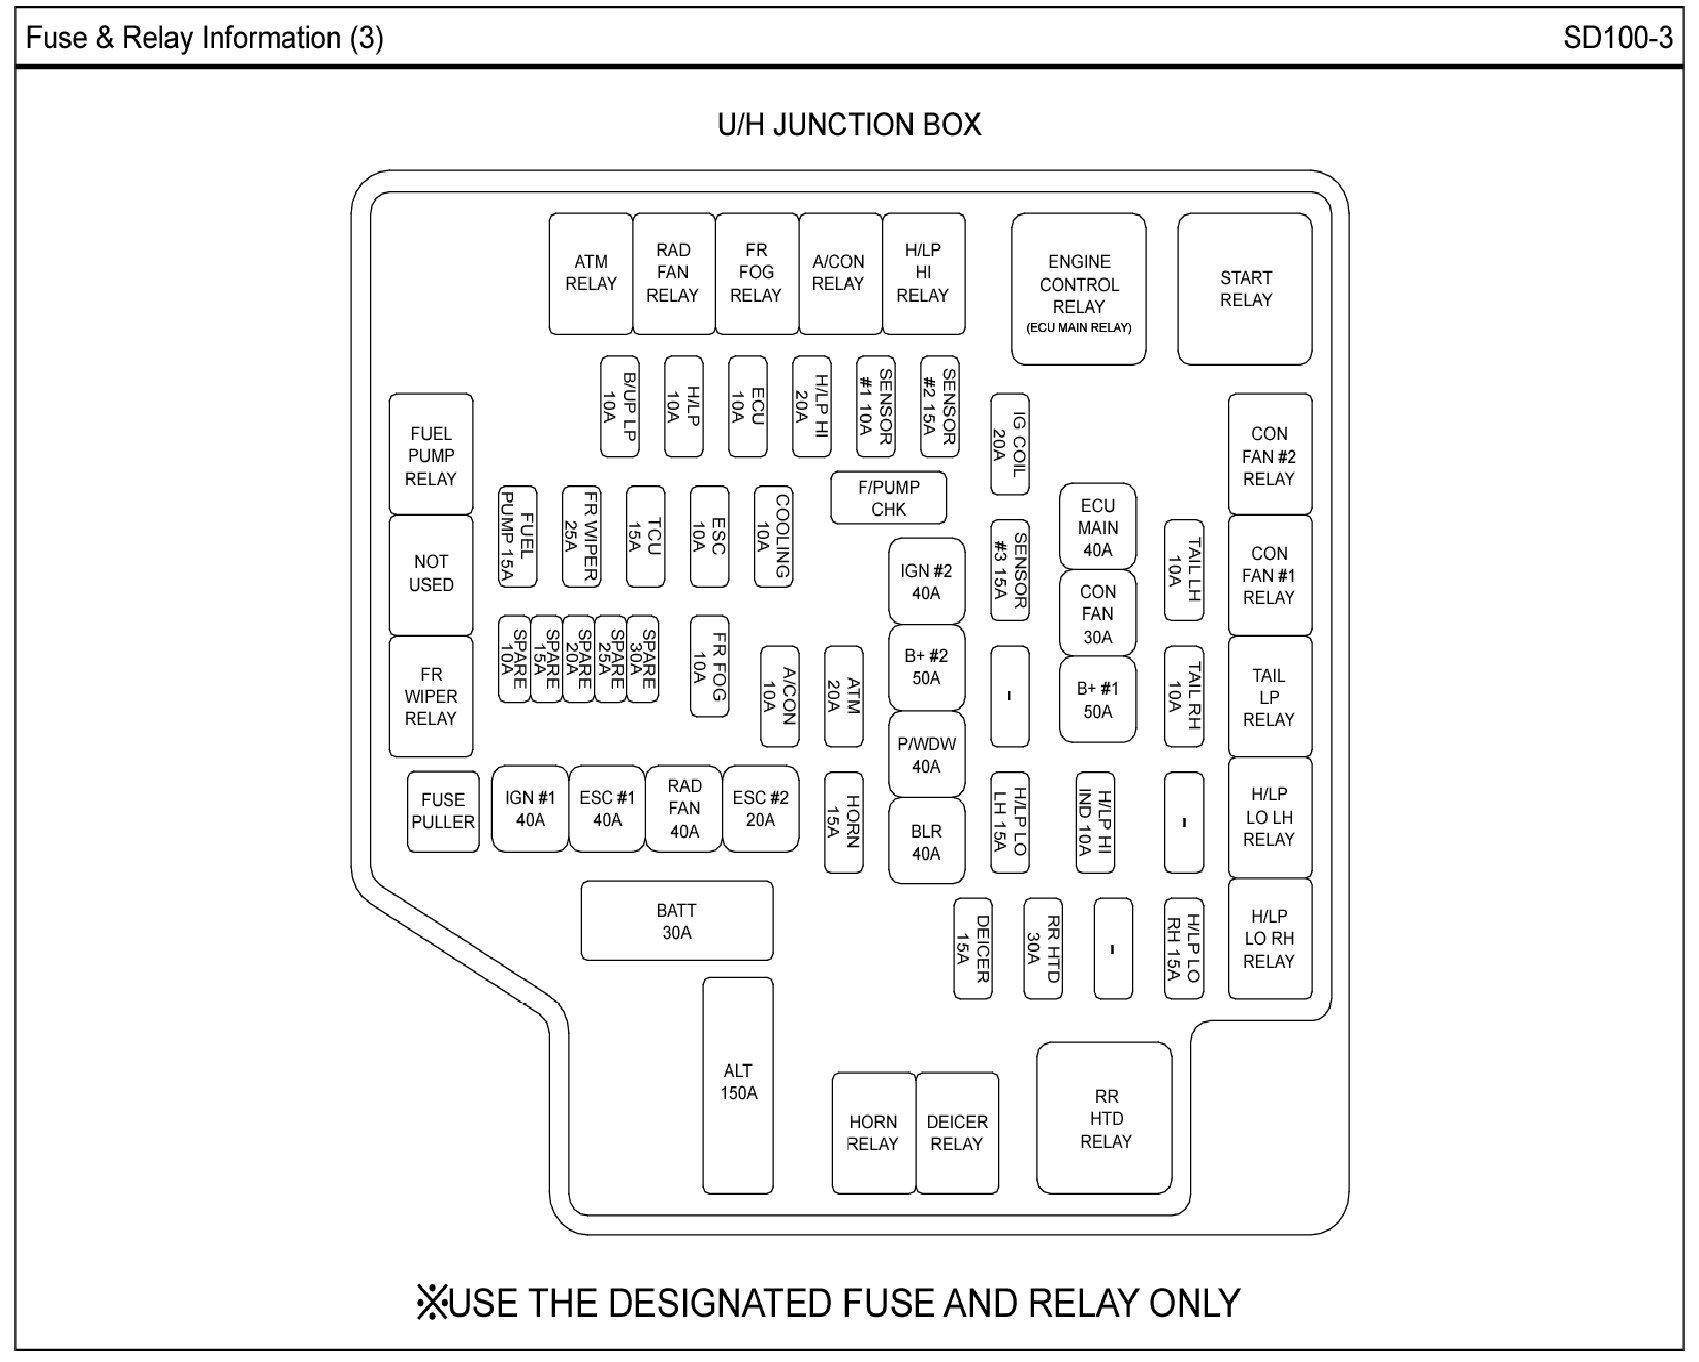 [ANLQ_8698]  WM_5665] Hyundai Tucson Fuse Box Diagram On 2004 Chevy Malibu Wiring Diagram  Schematic Wiring | 04 Sonata Fuse Box |  | Salv Wned Bletu Joni Hete Dome Mohammedshrine Librar Wiring 101